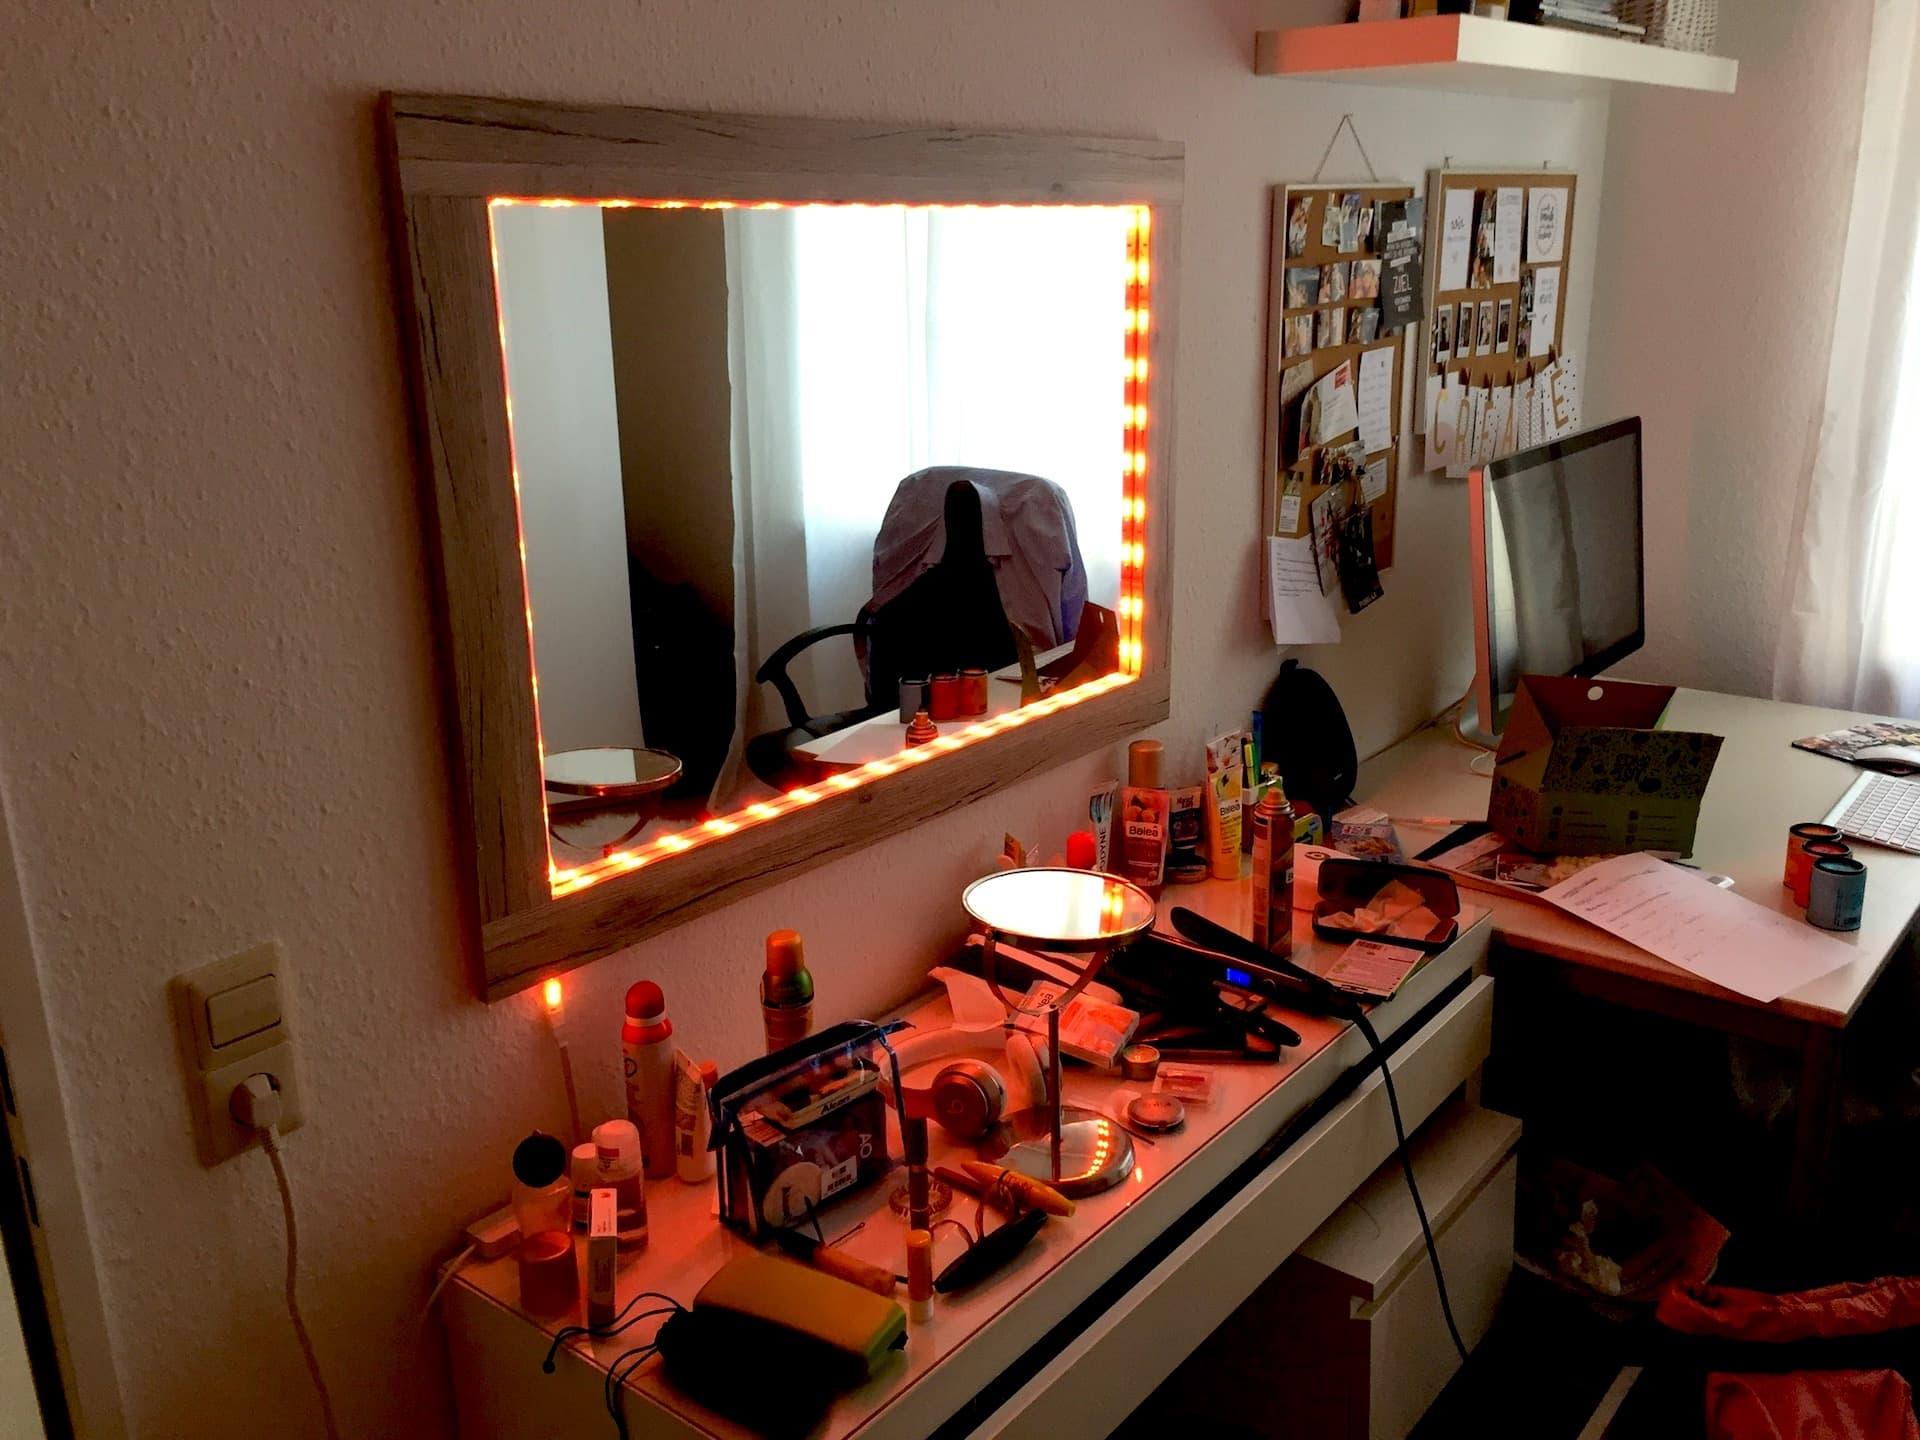 8 einrichtungs ideen mit philips hue lampen homesuits. Black Bedroom Furniture Sets. Home Design Ideas